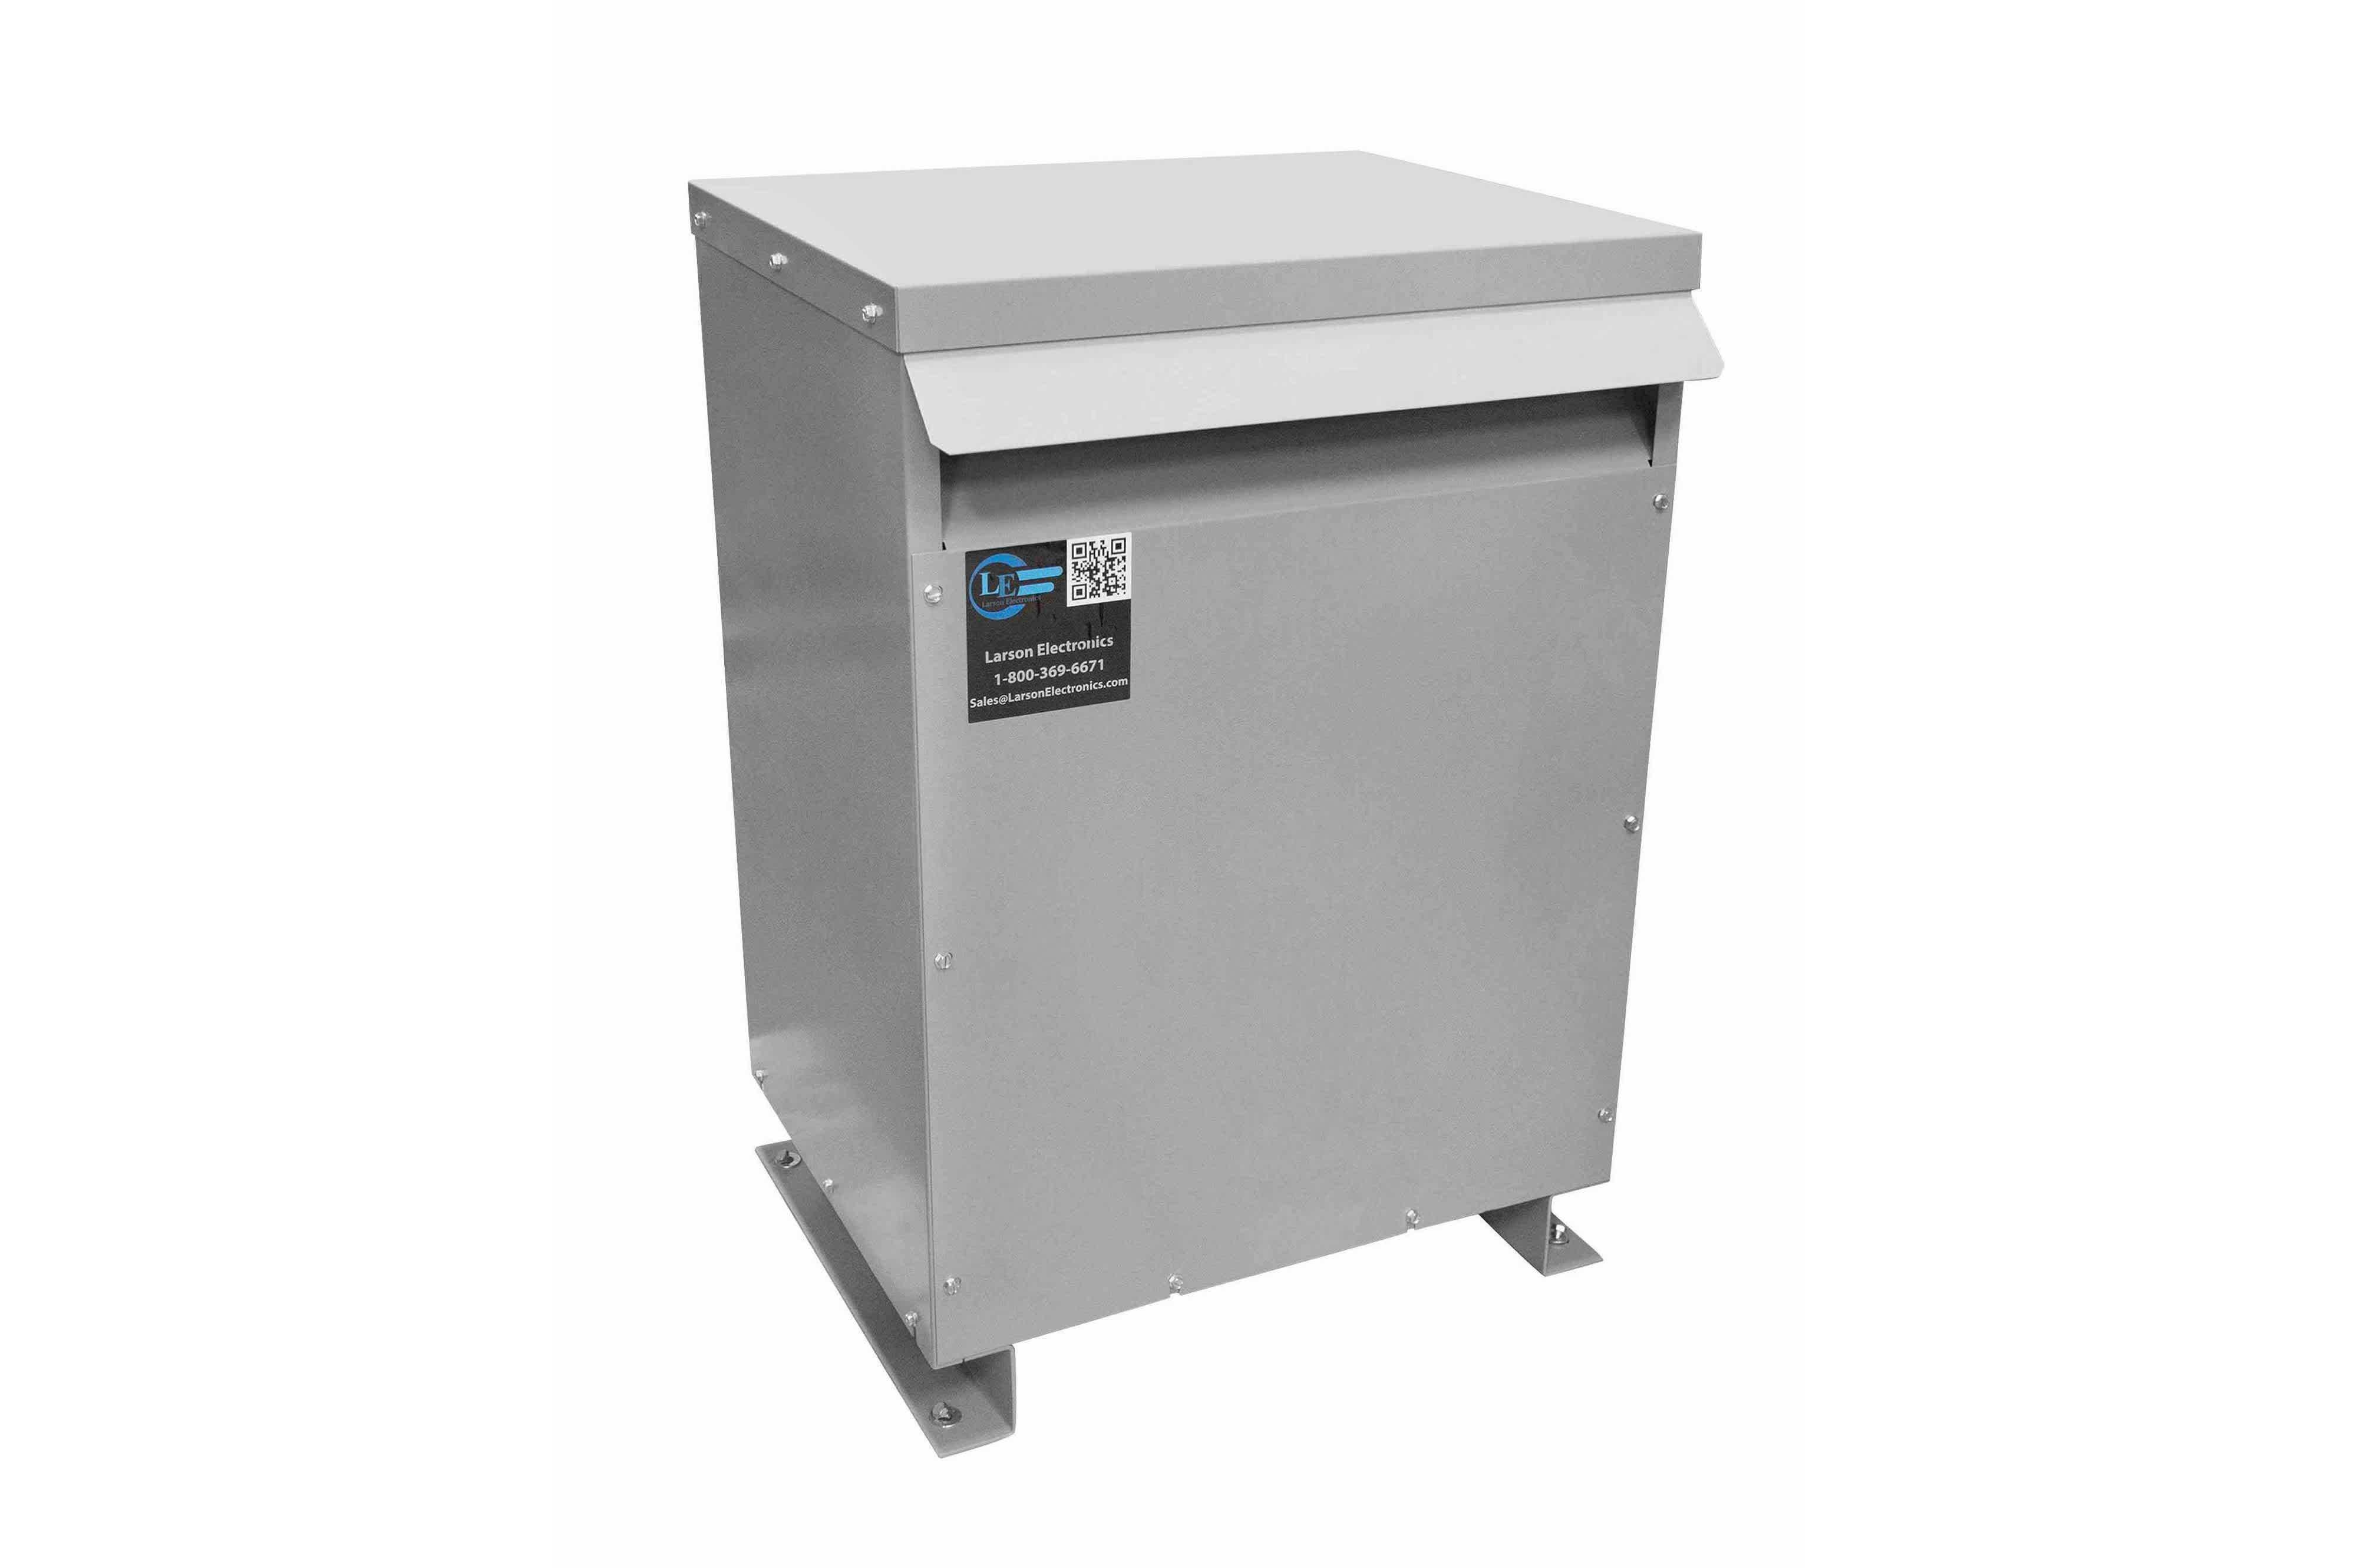 15 kVA 3PH Isolation Transformer, 600V Wye Primary, 208V Delta Secondary, N3R, Ventilated, 60 Hz